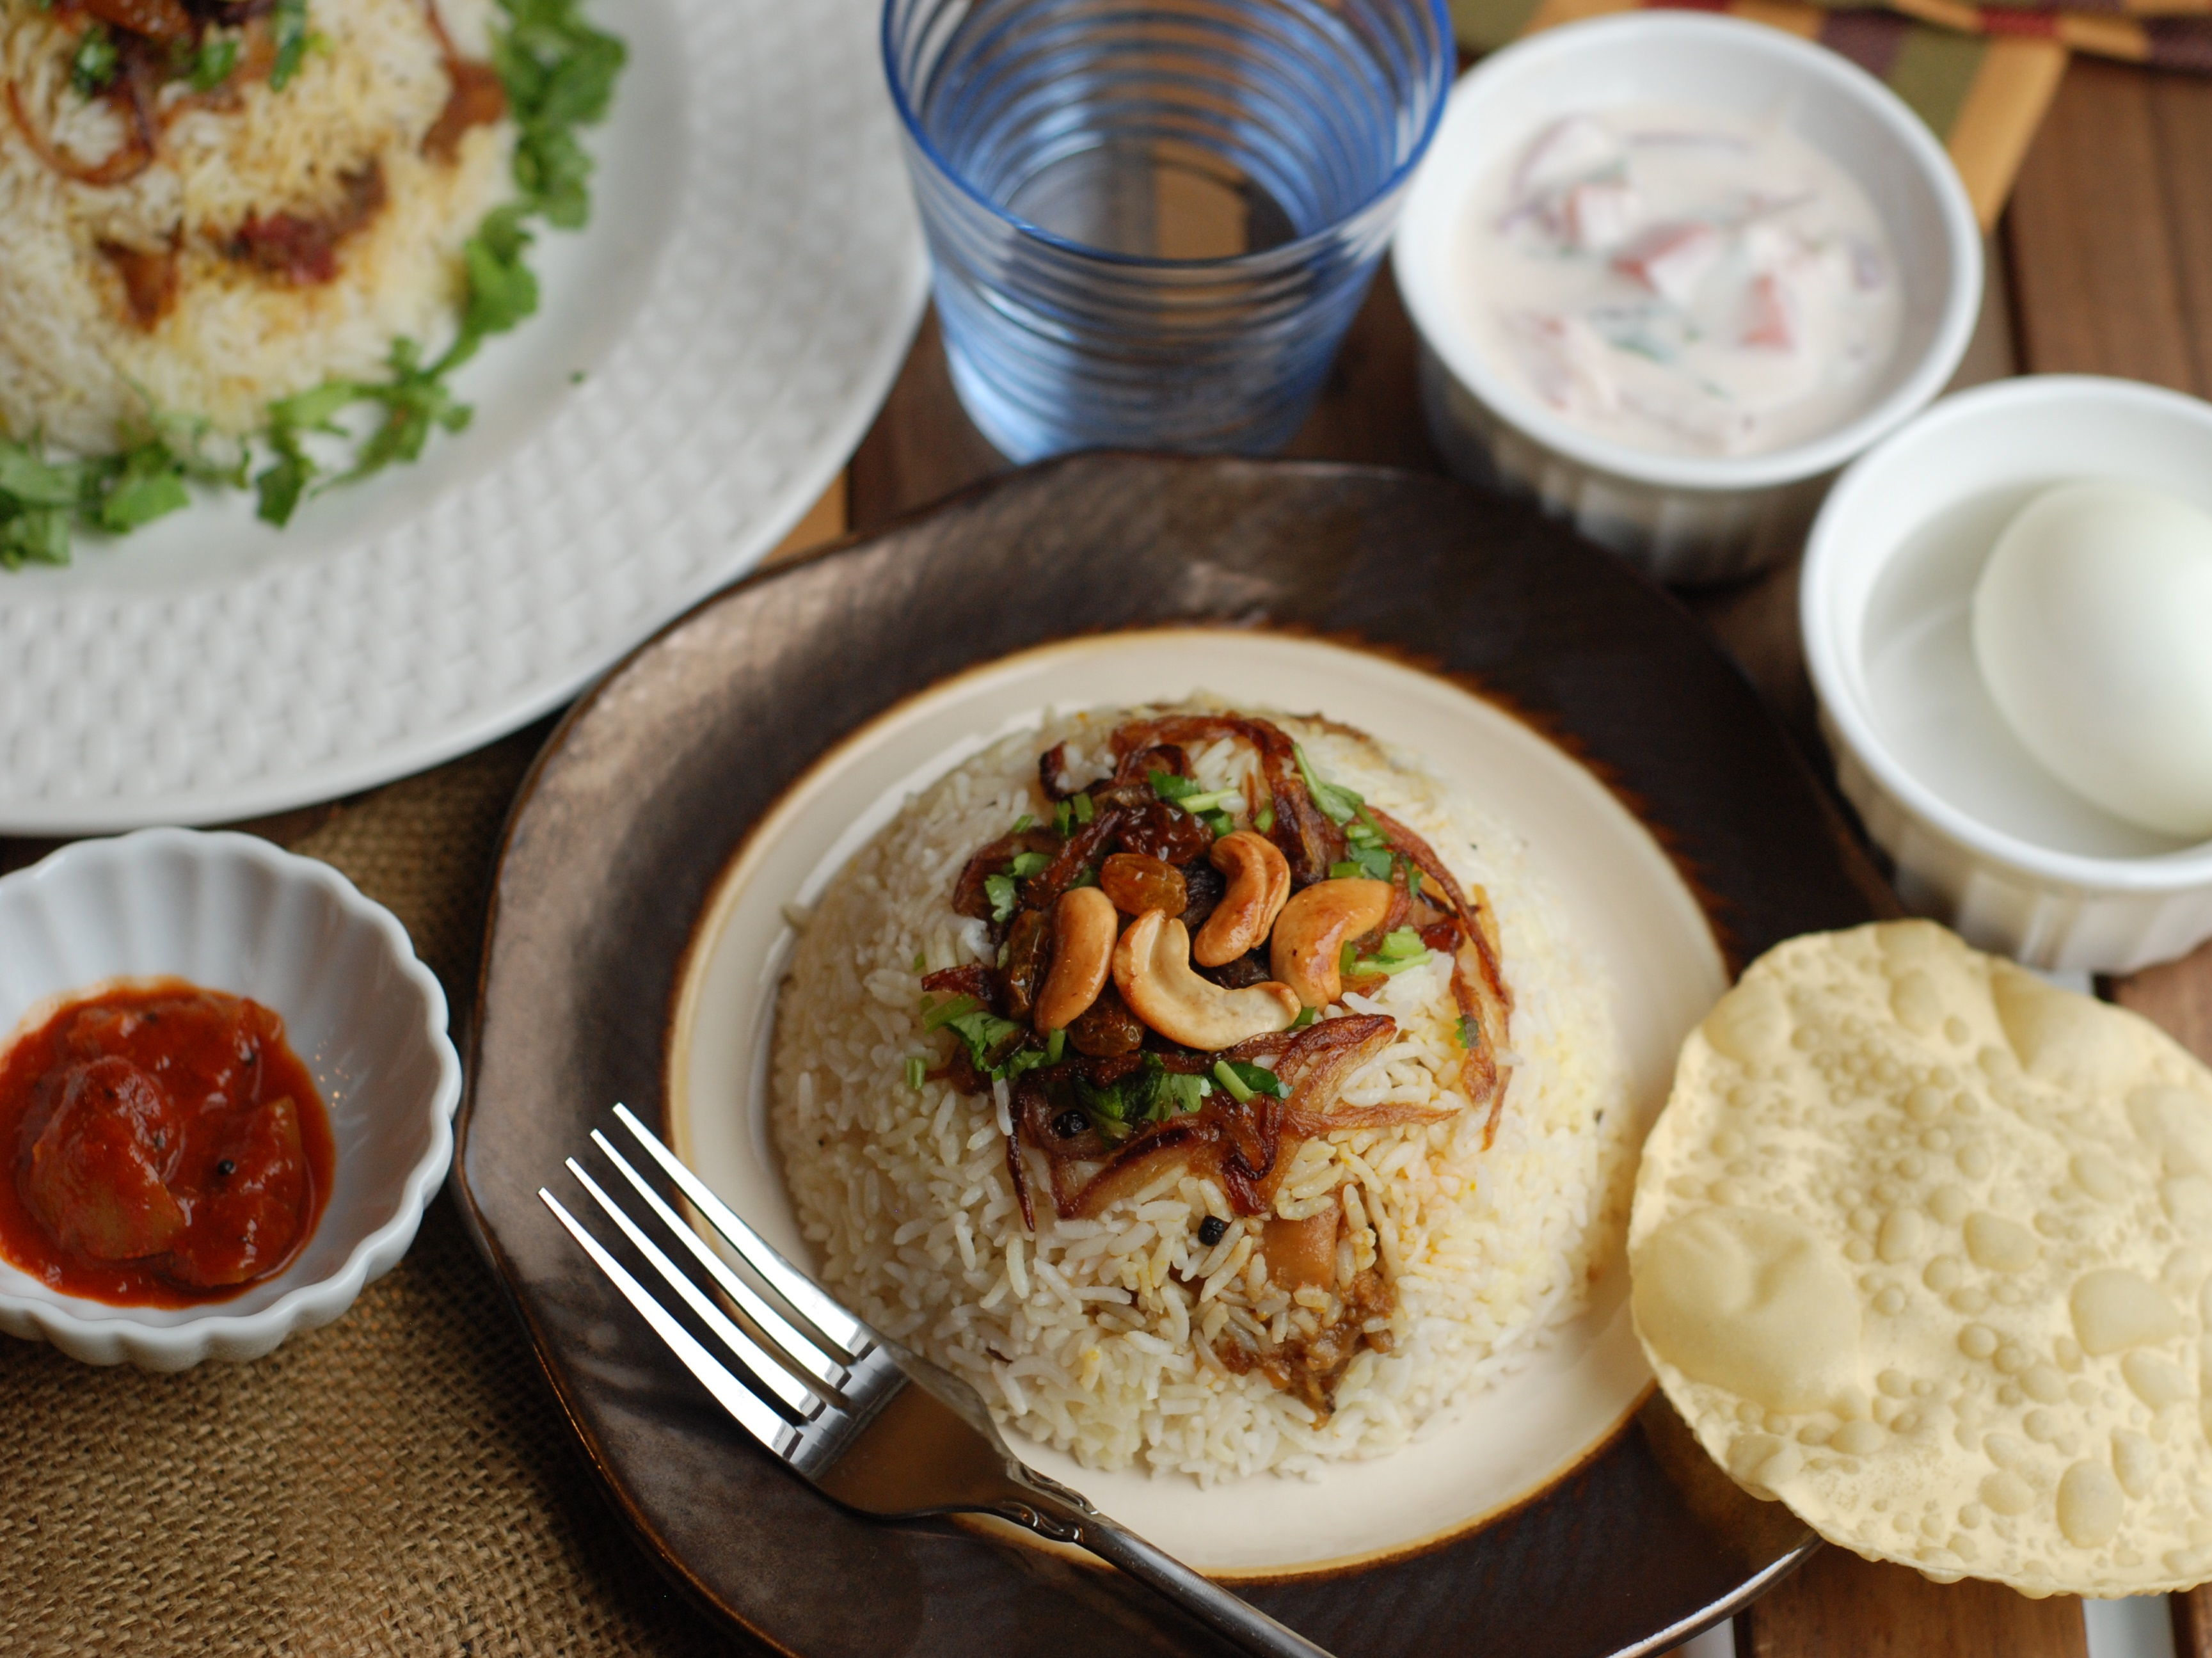 Kerala christmas recipes yummy o yummy biriyani pulao fried rice forumfinder Images